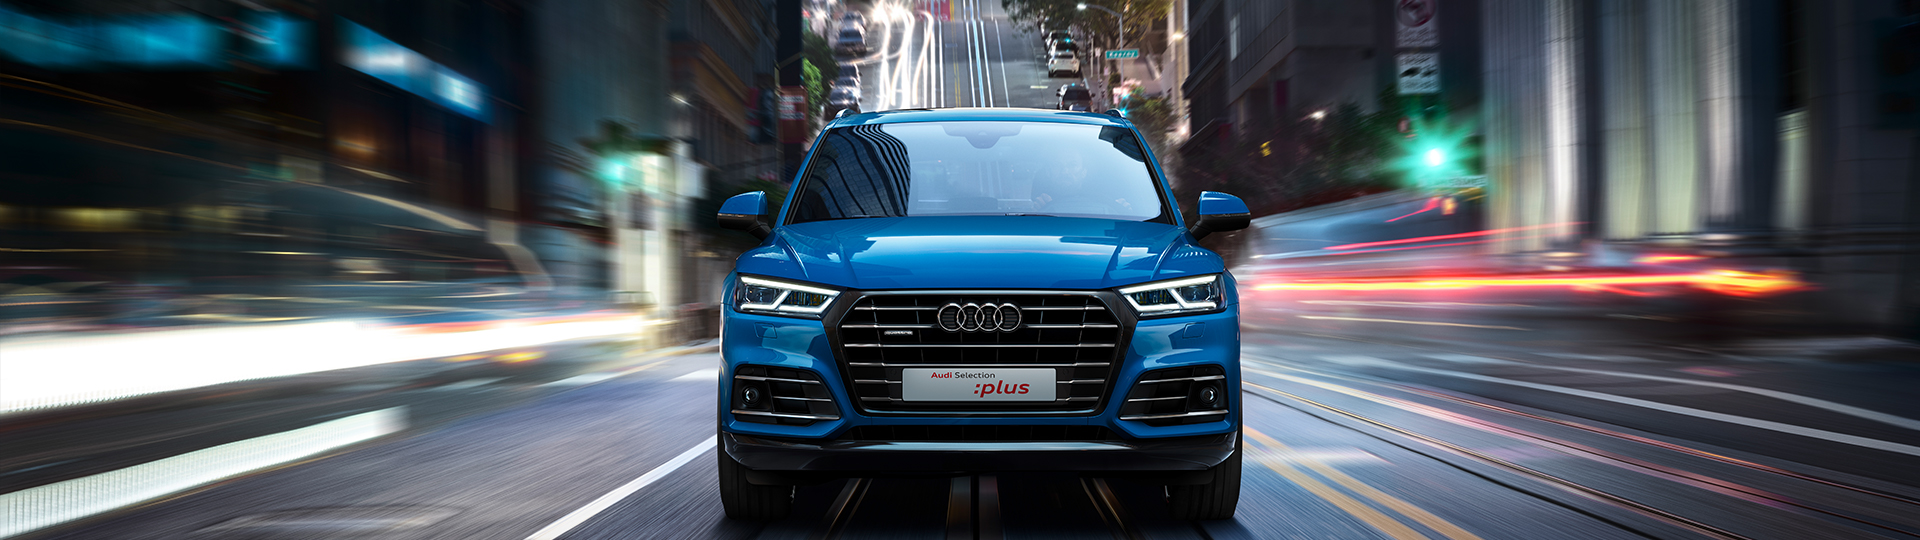 Audi-Selection-Plus